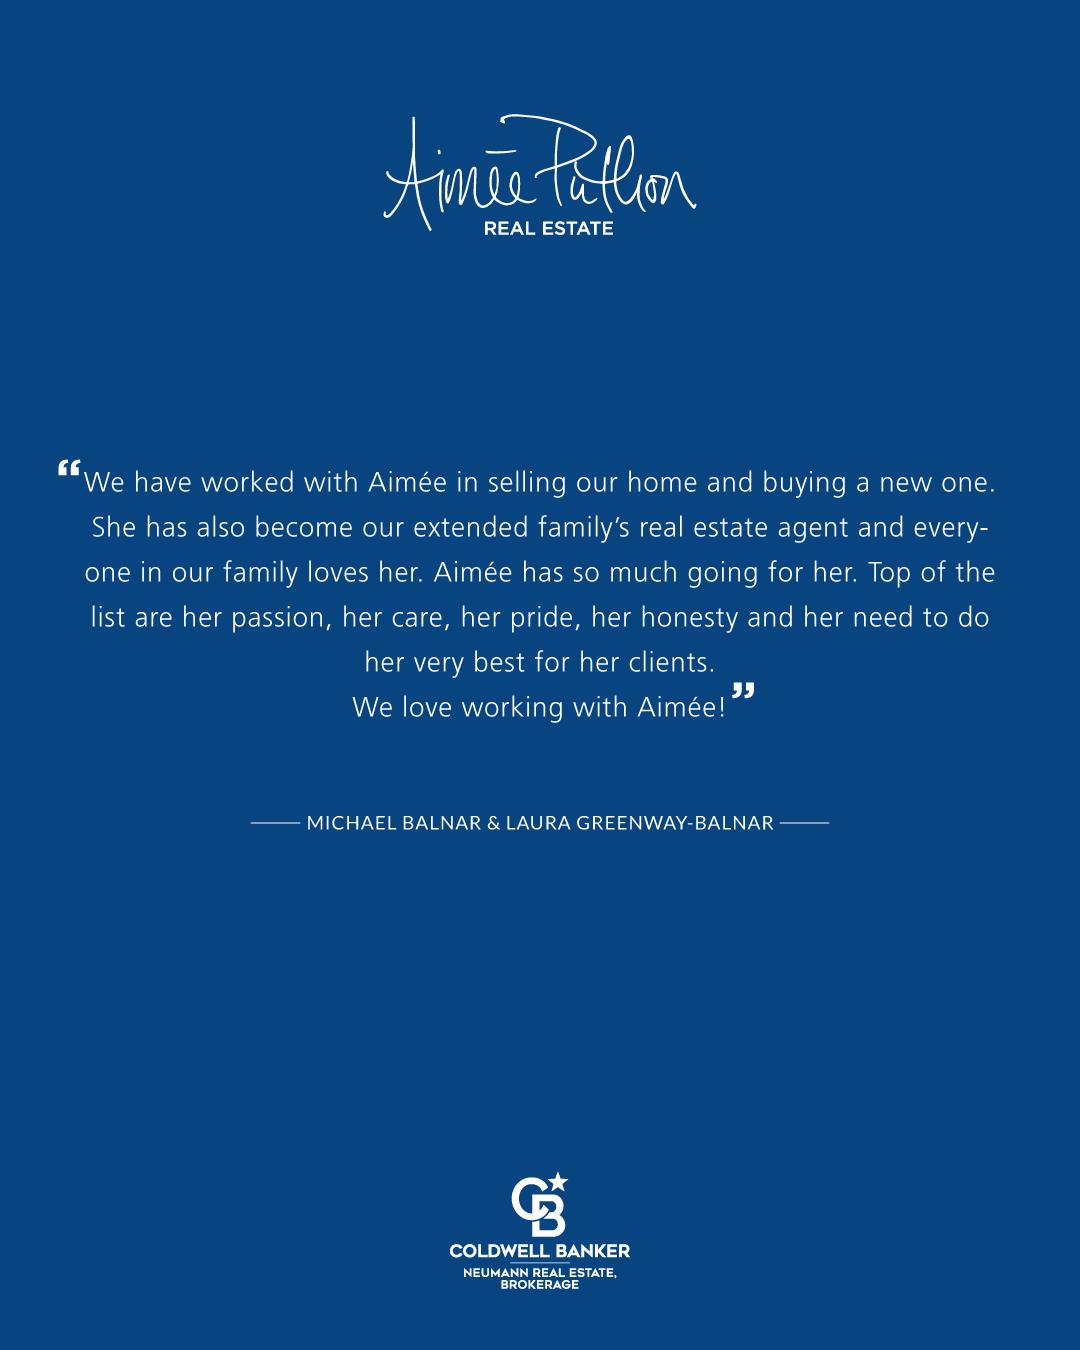 Aimée Puthon RE Testimonial